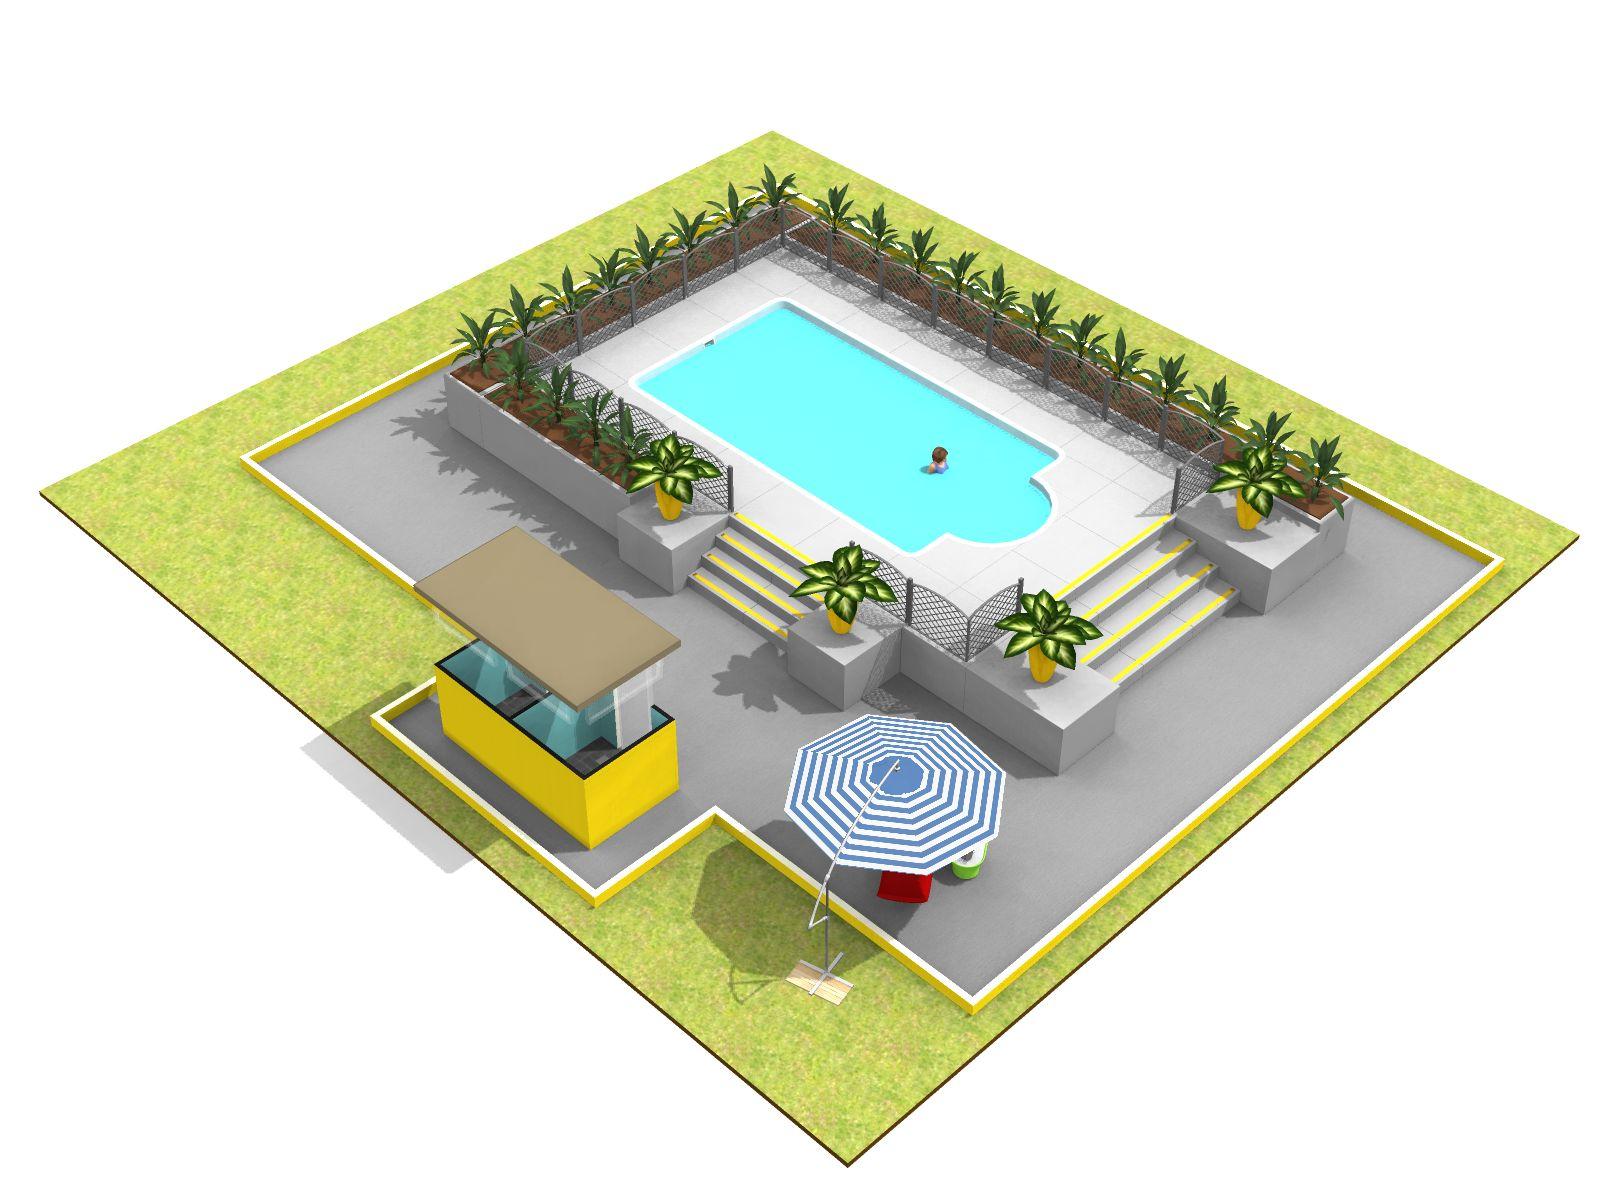 swimming pool 2 homebyme. Black Bedroom Furniture Sets. Home Design Ideas